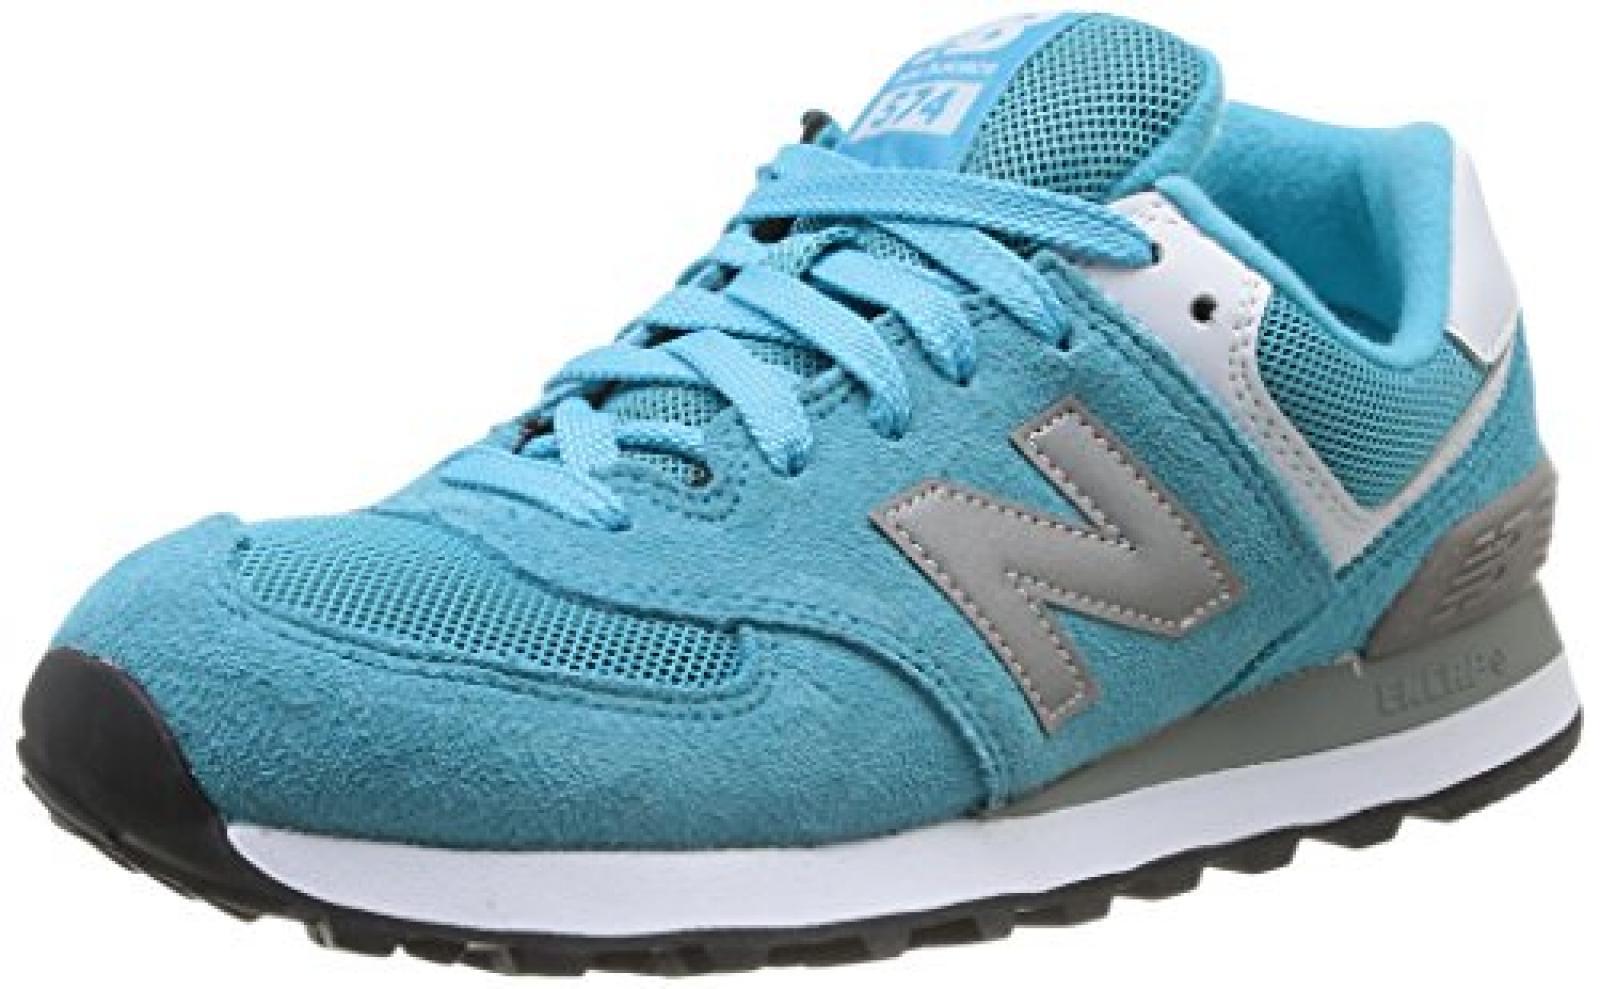 New Balance WL574 B Damen Sneakers